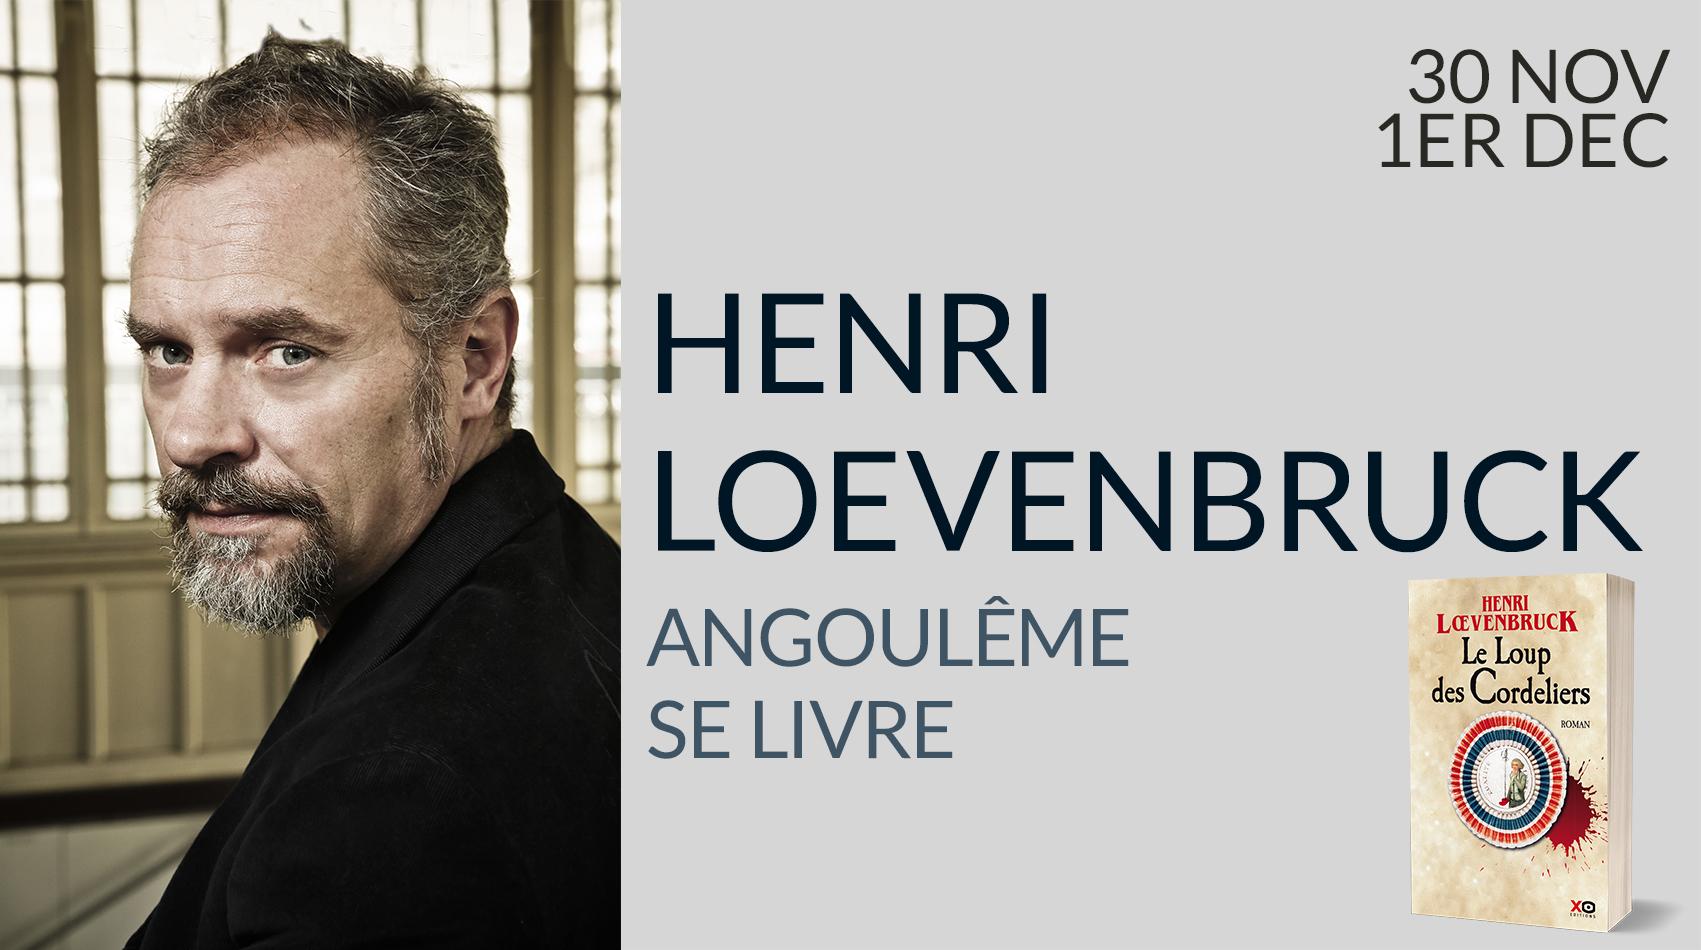 HENRI LOEVENBRUCK AU FESTIVAL ANGOULÊME SE LIVRE